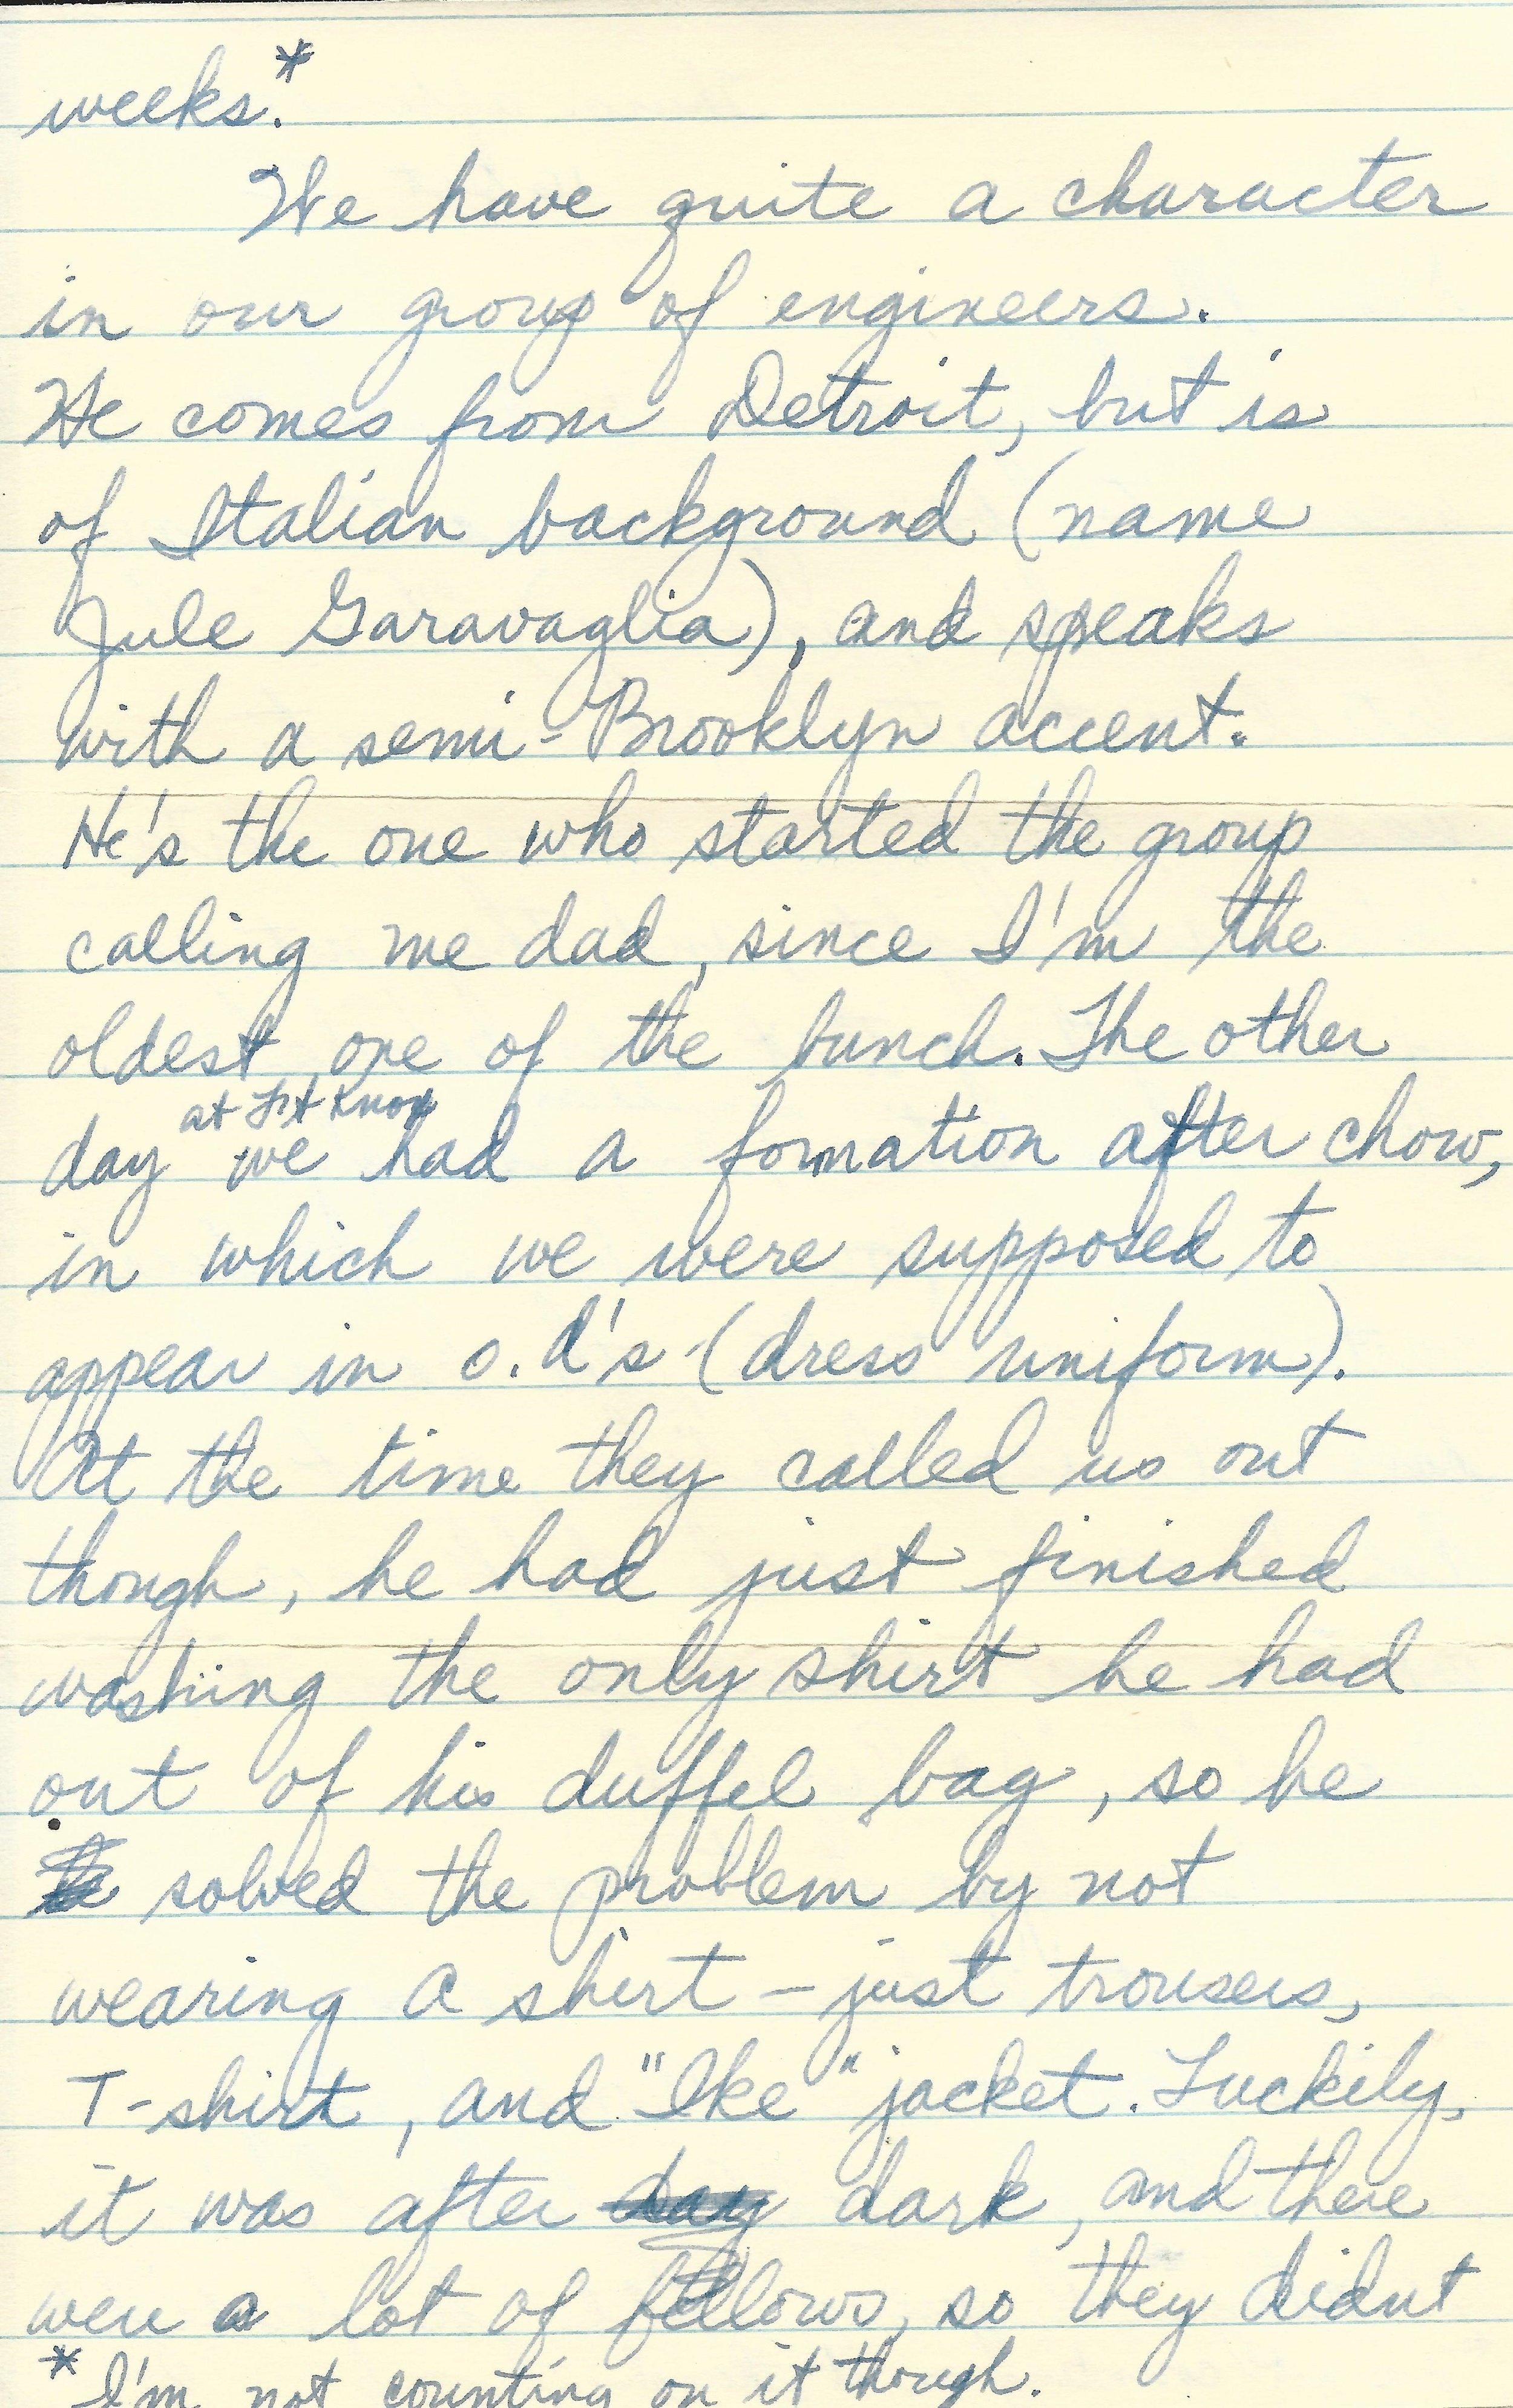 5. Oct. 16, 1952 (Opa)_Page_3.jpg